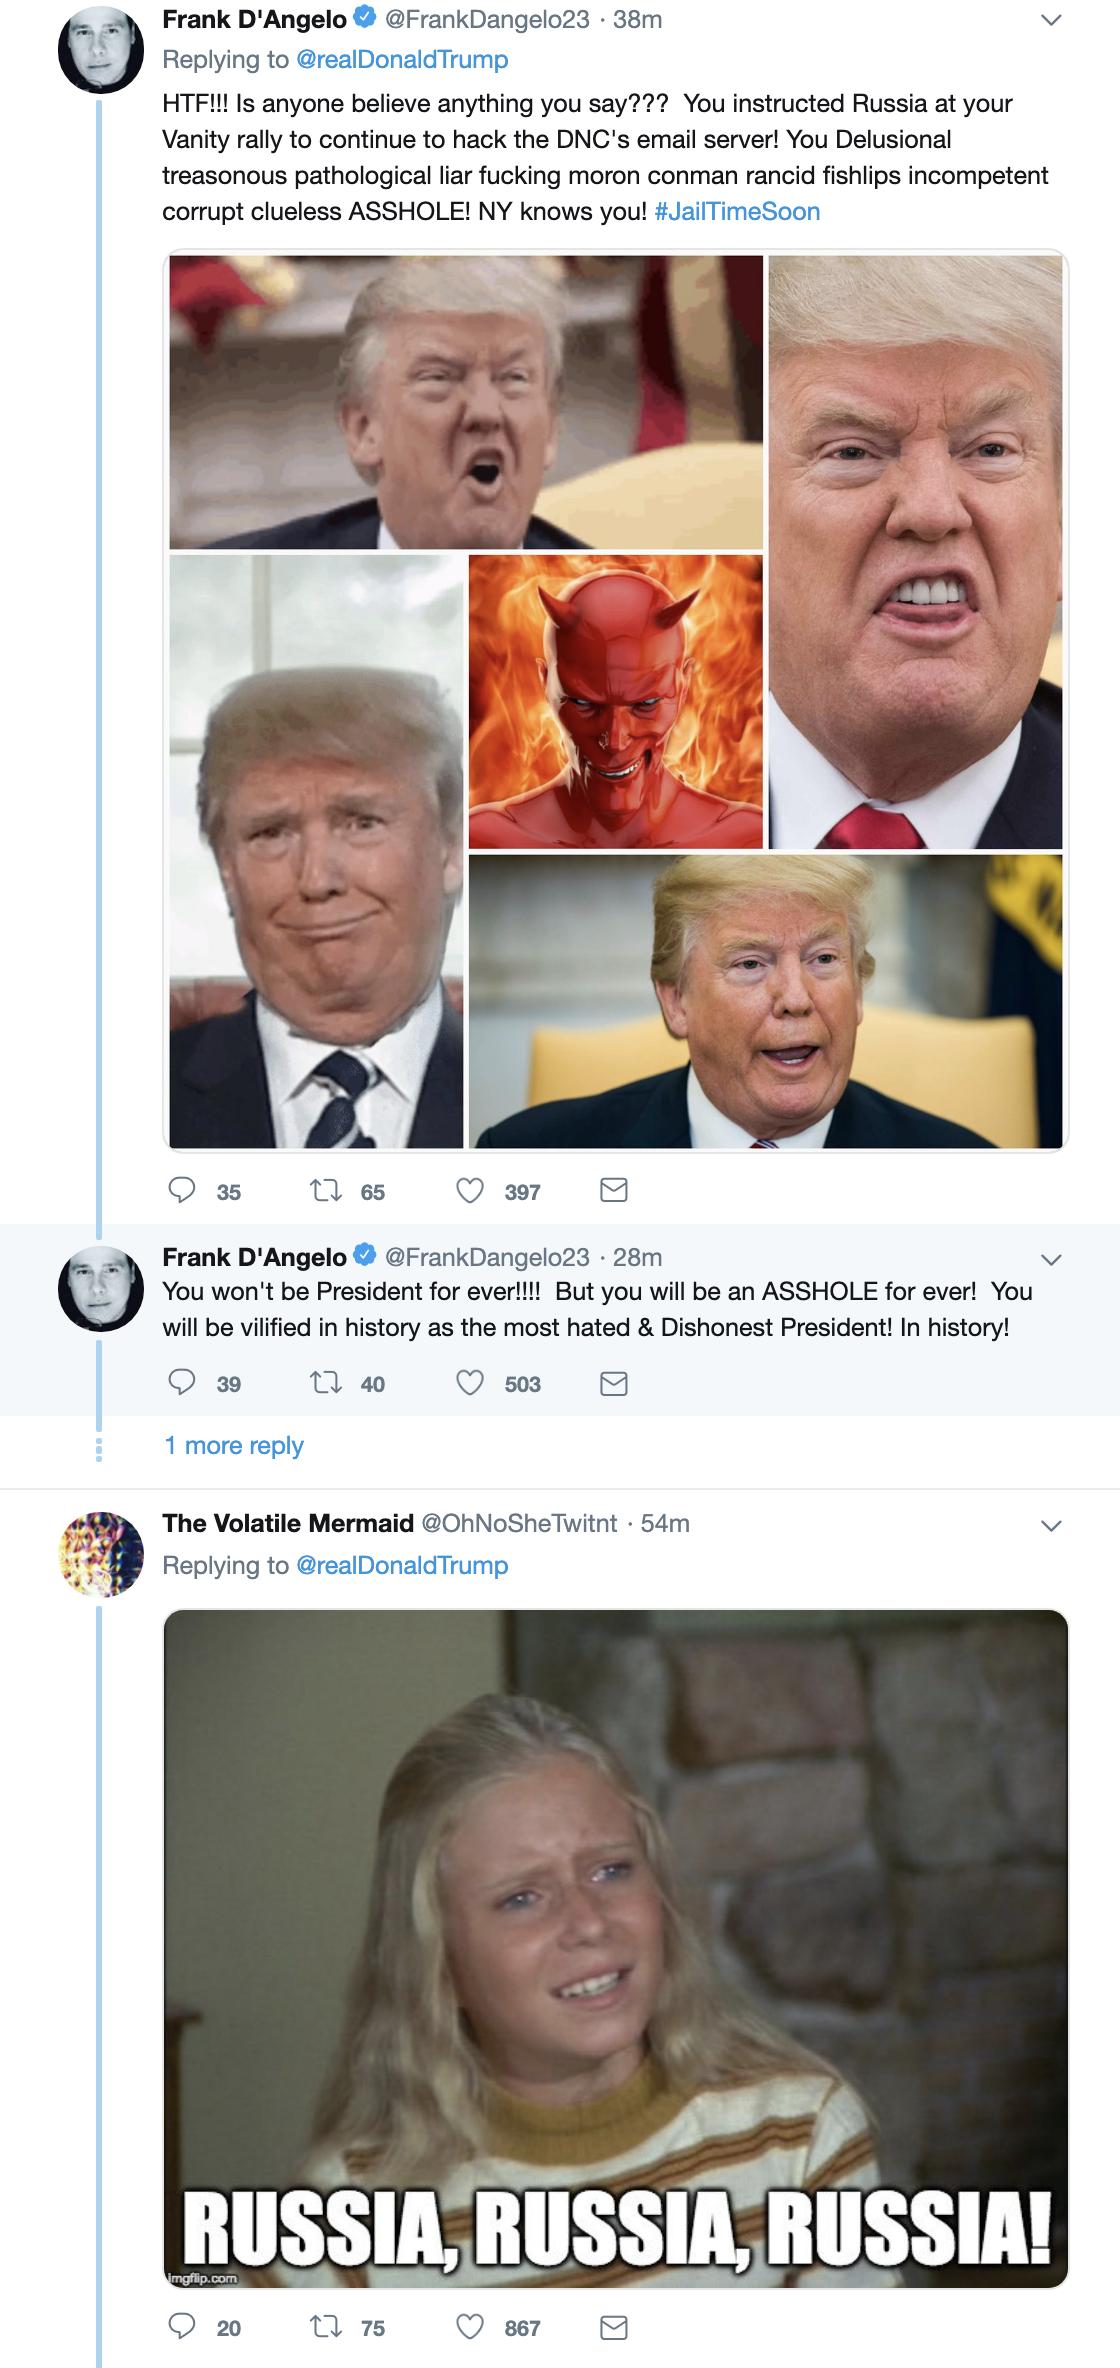 Screen-Shot-2019-05-30-at-8.36.59-AM Trump Denies AM Mueller Rant Moments After He Tweeted It (VIDEO) Corruption Crime Donald Trump Election 2016 Impeachment Investigation Mueller Politics Robert Mueller Russia Top Stories